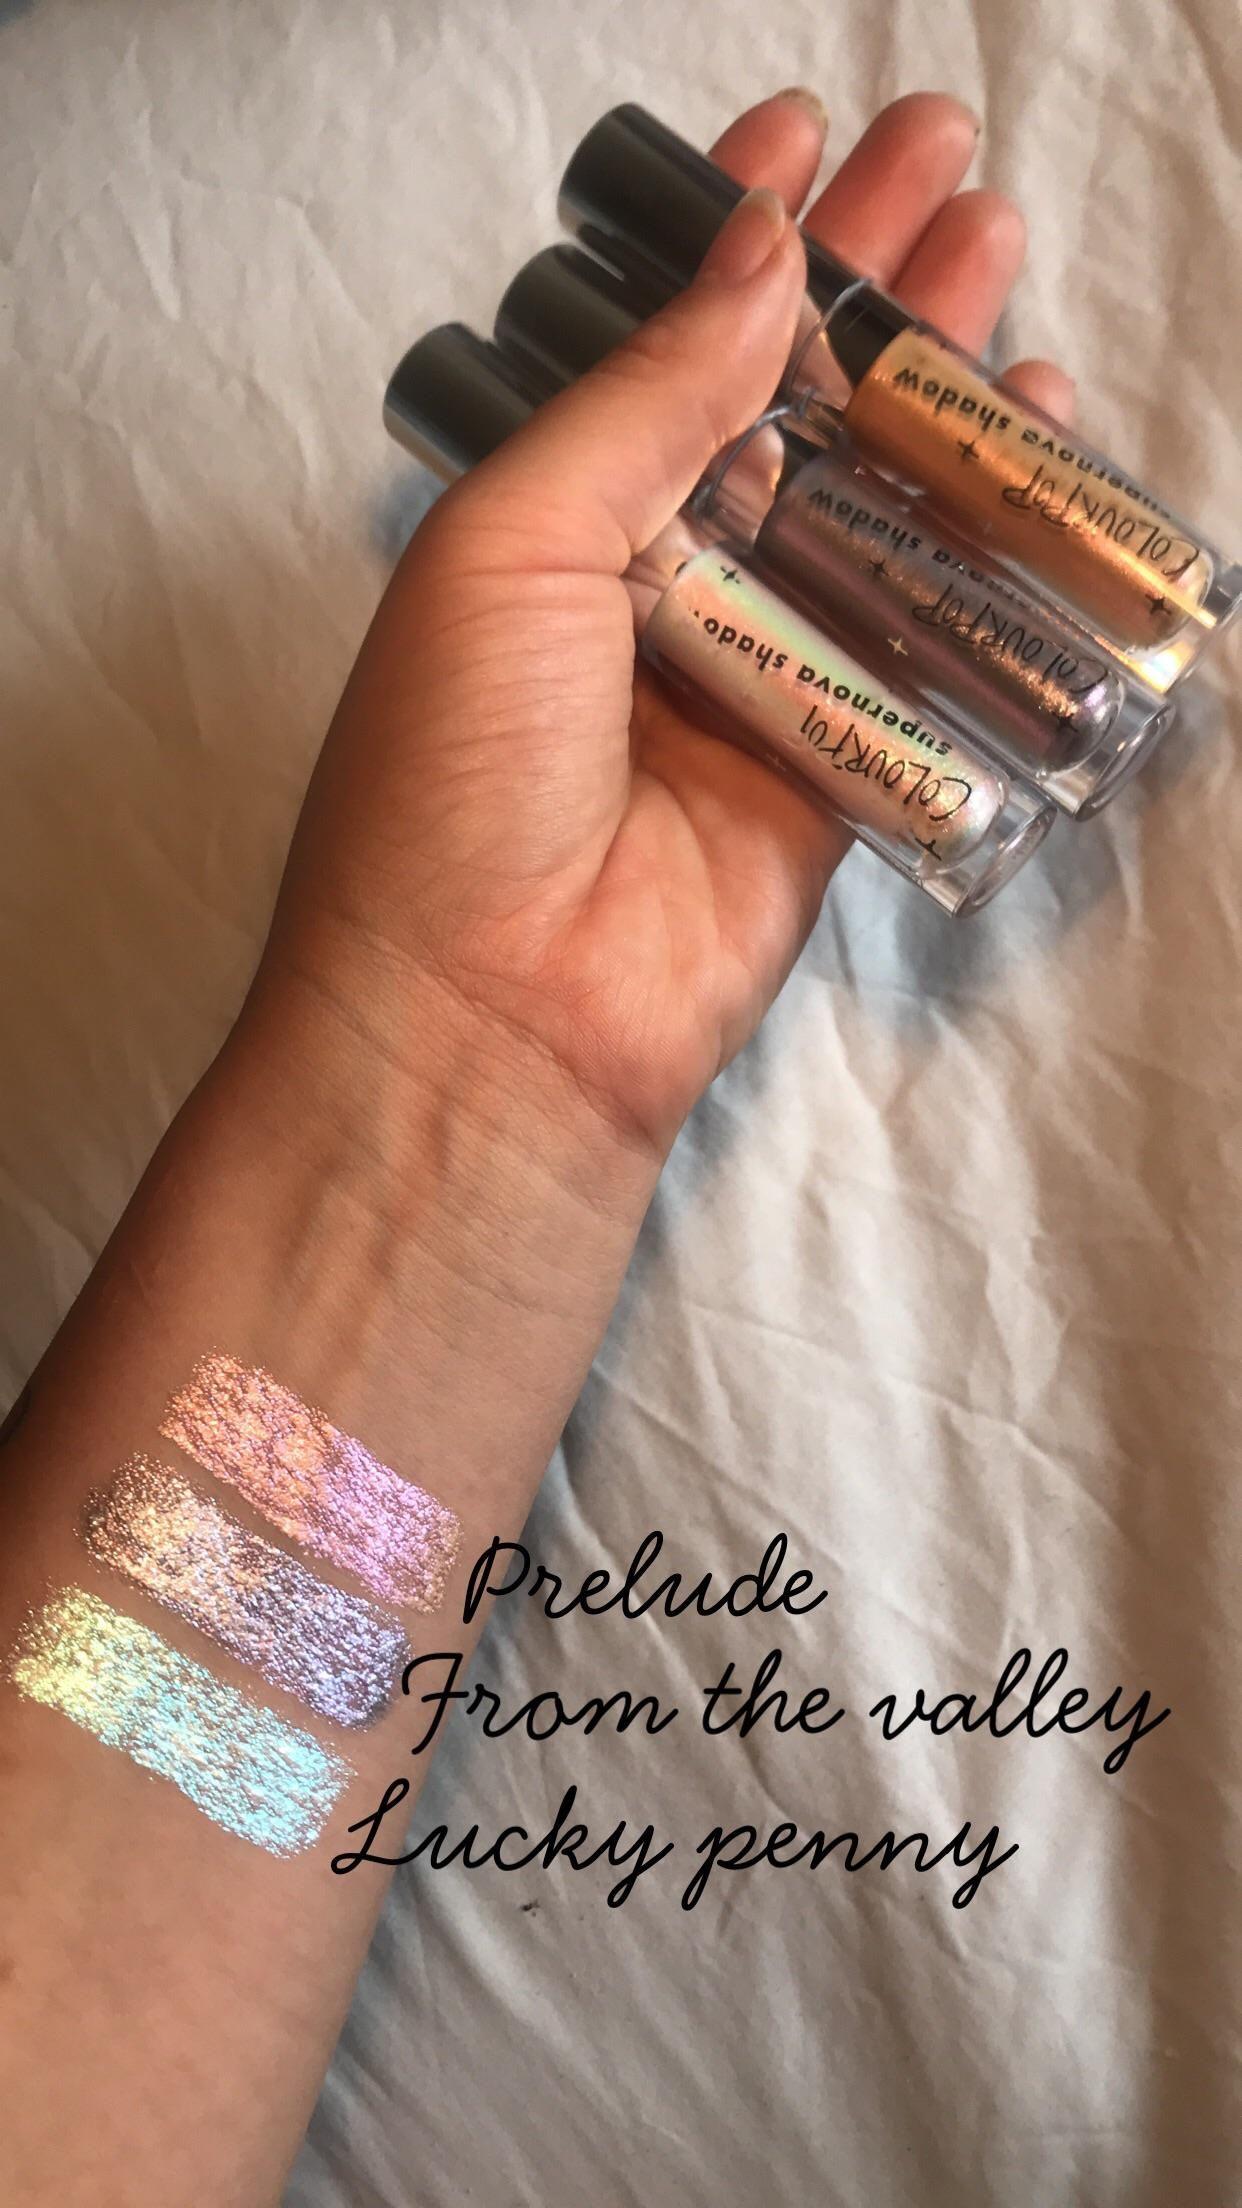 Diamond Glow Powder by Artist Couture #13